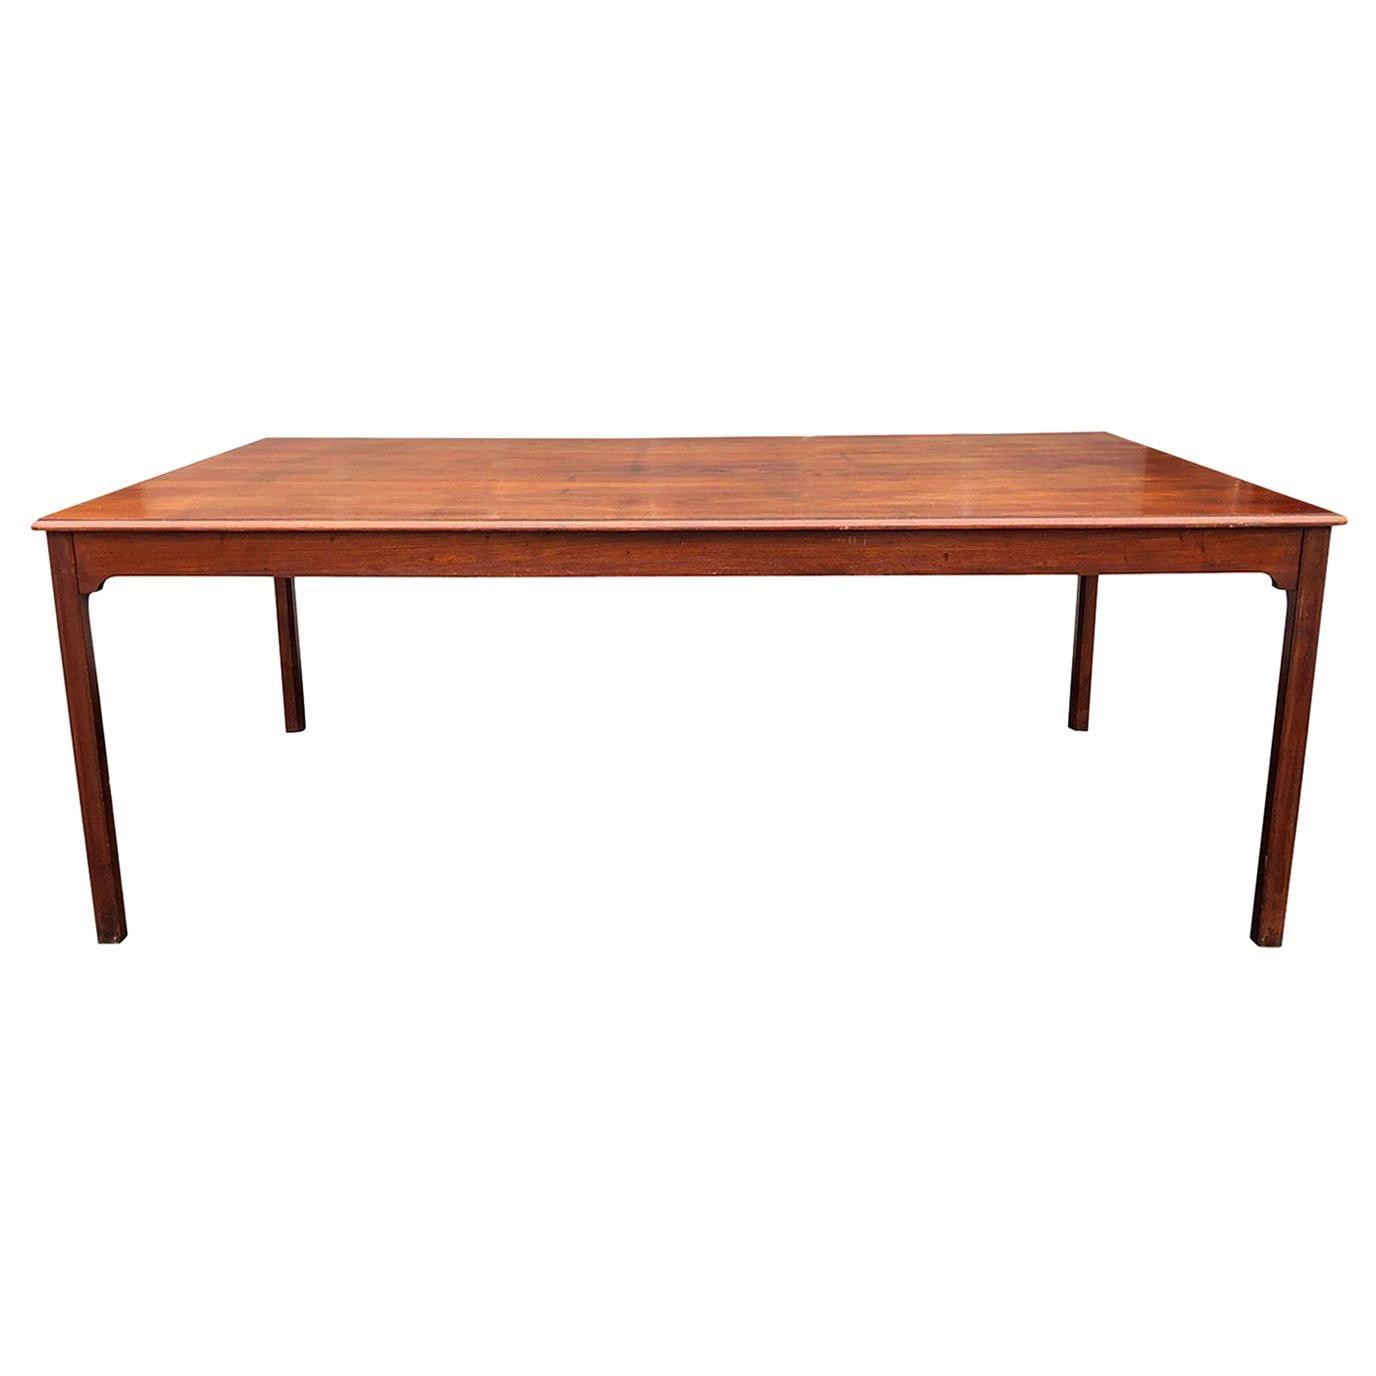 20th Century Center Table, Danish Cuban Mahogany Dining Table by Kaare Klint